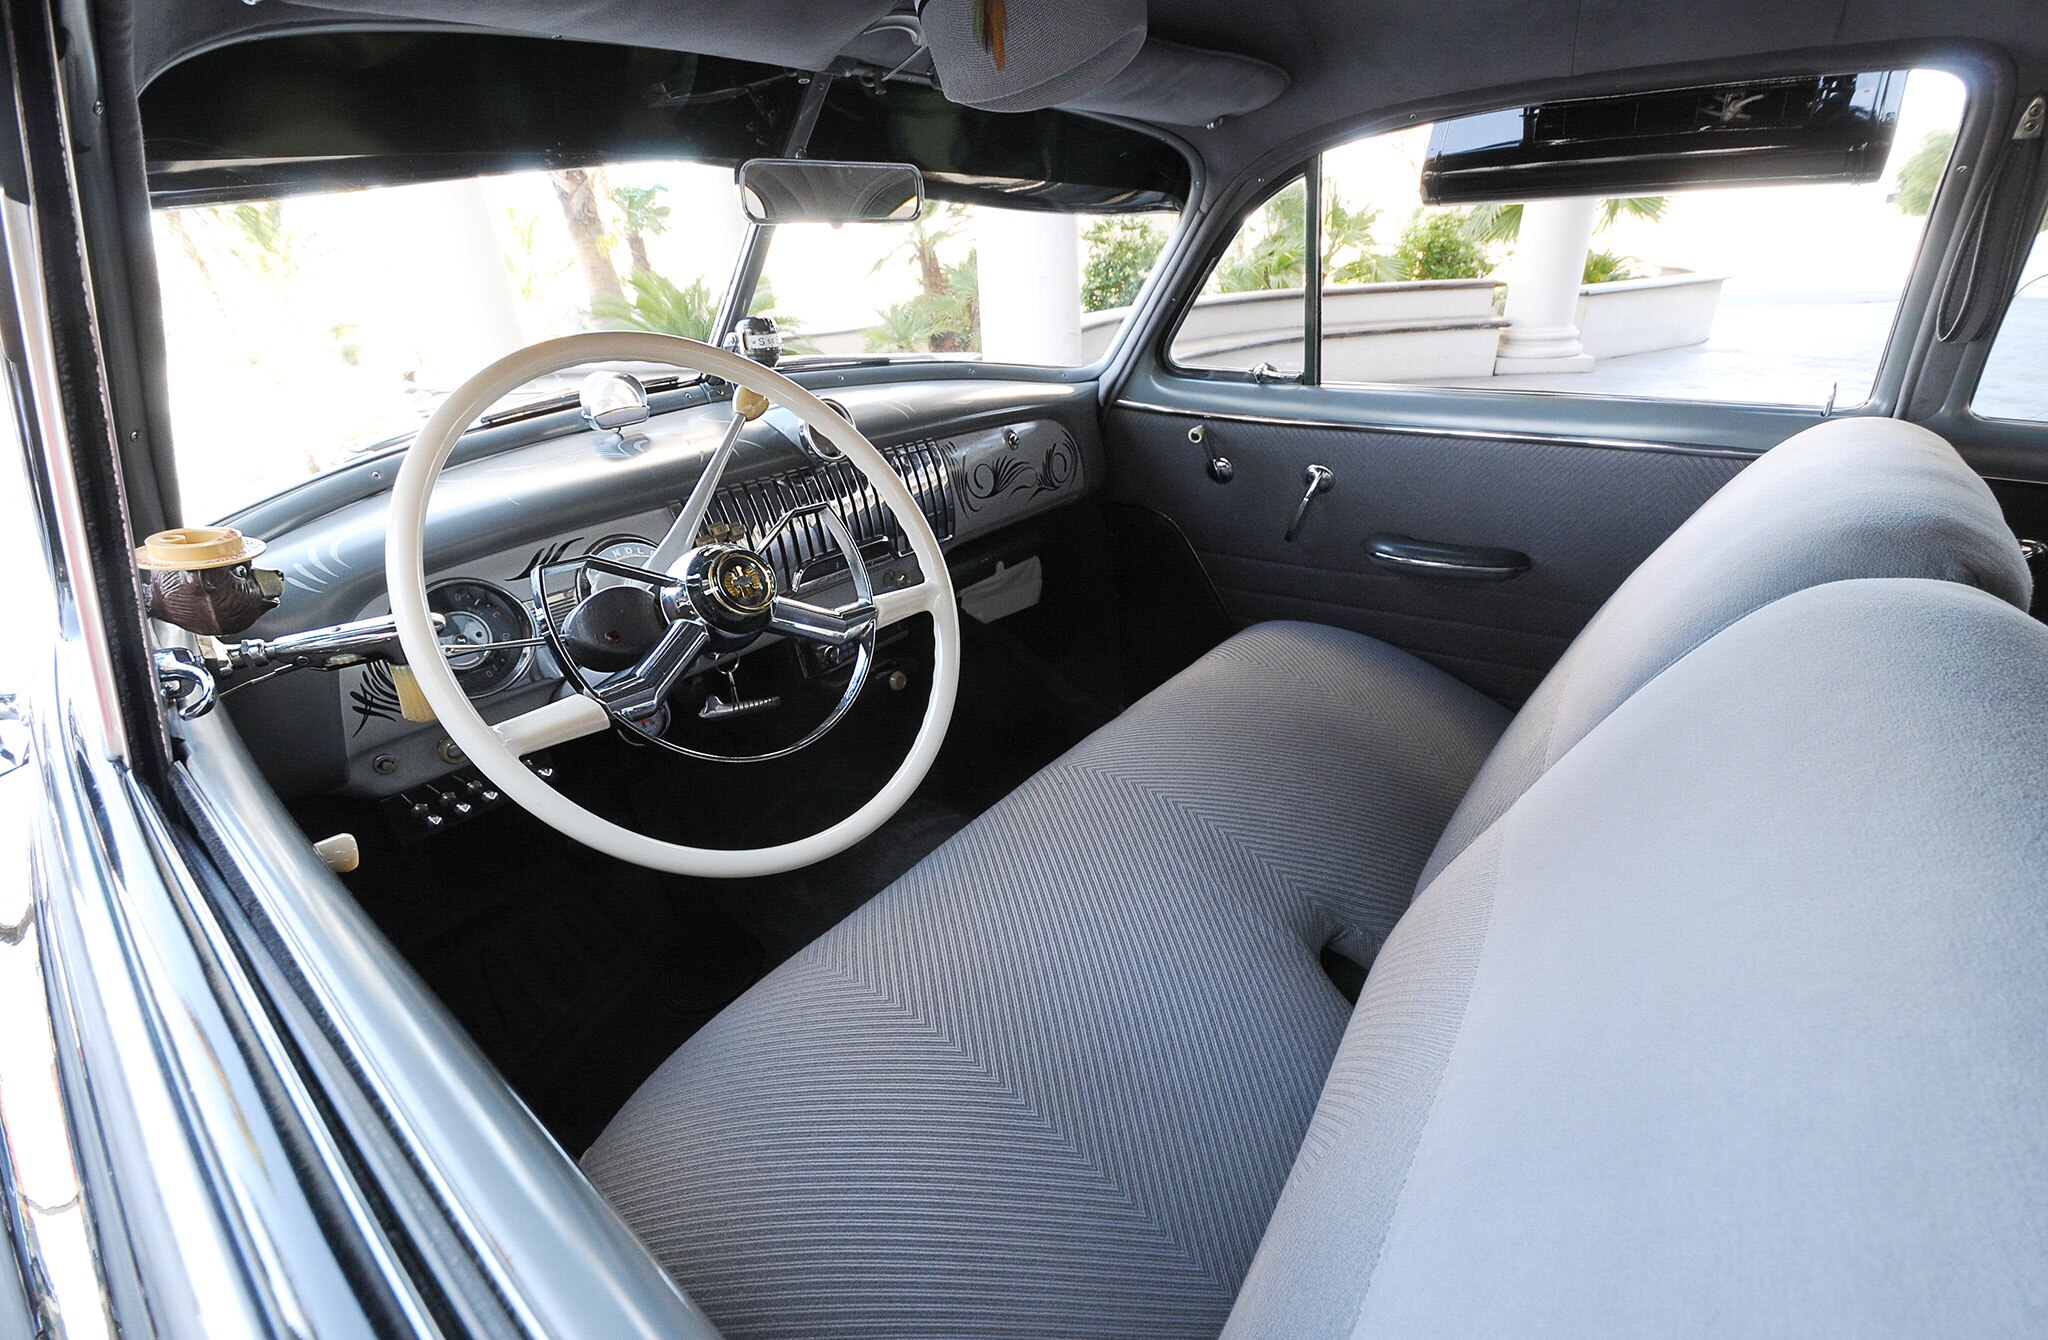 Chevrolet Deluxe Interior on 1985 Buick Regal